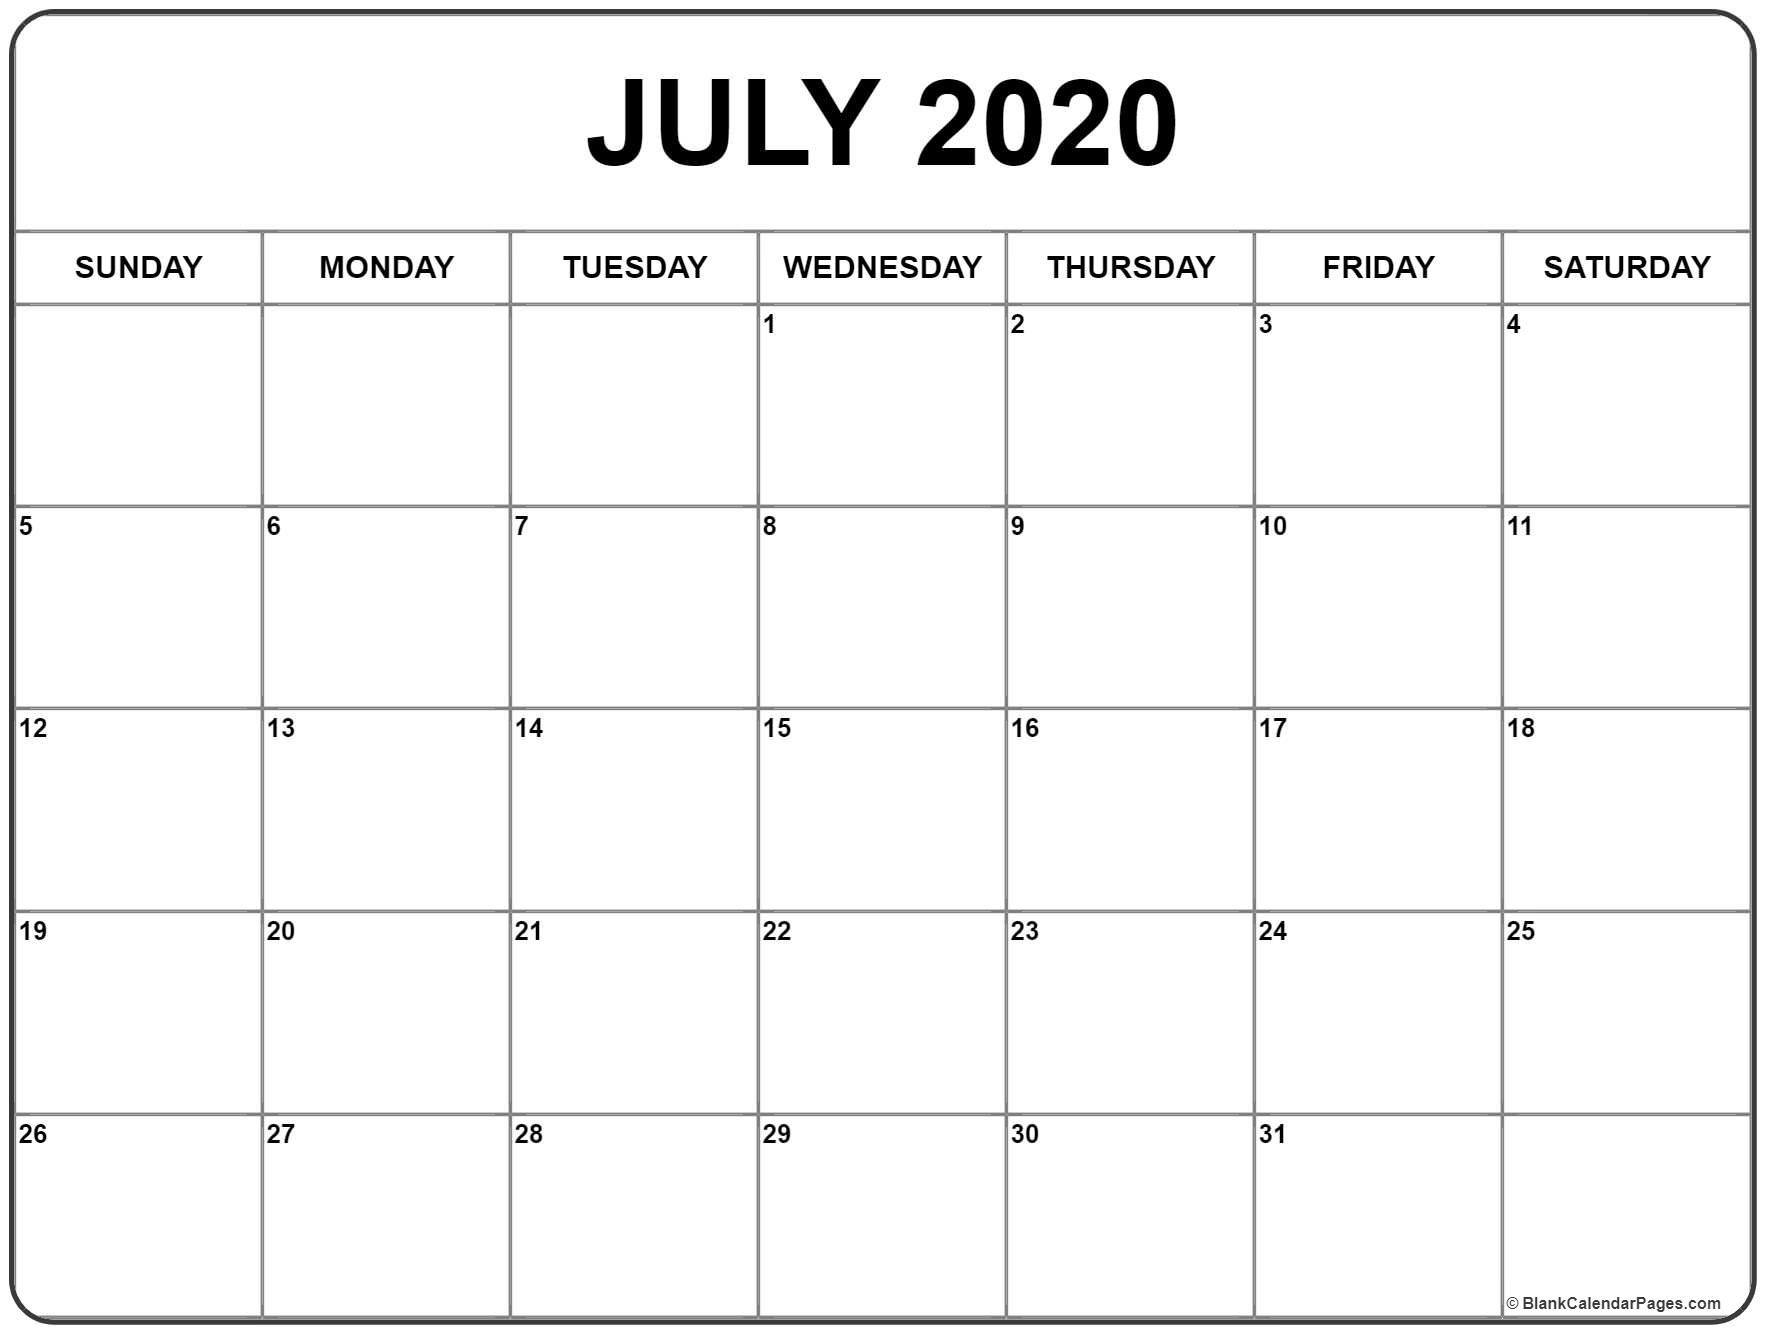 July 2020 Calendar | Printable Blank Calendar, January